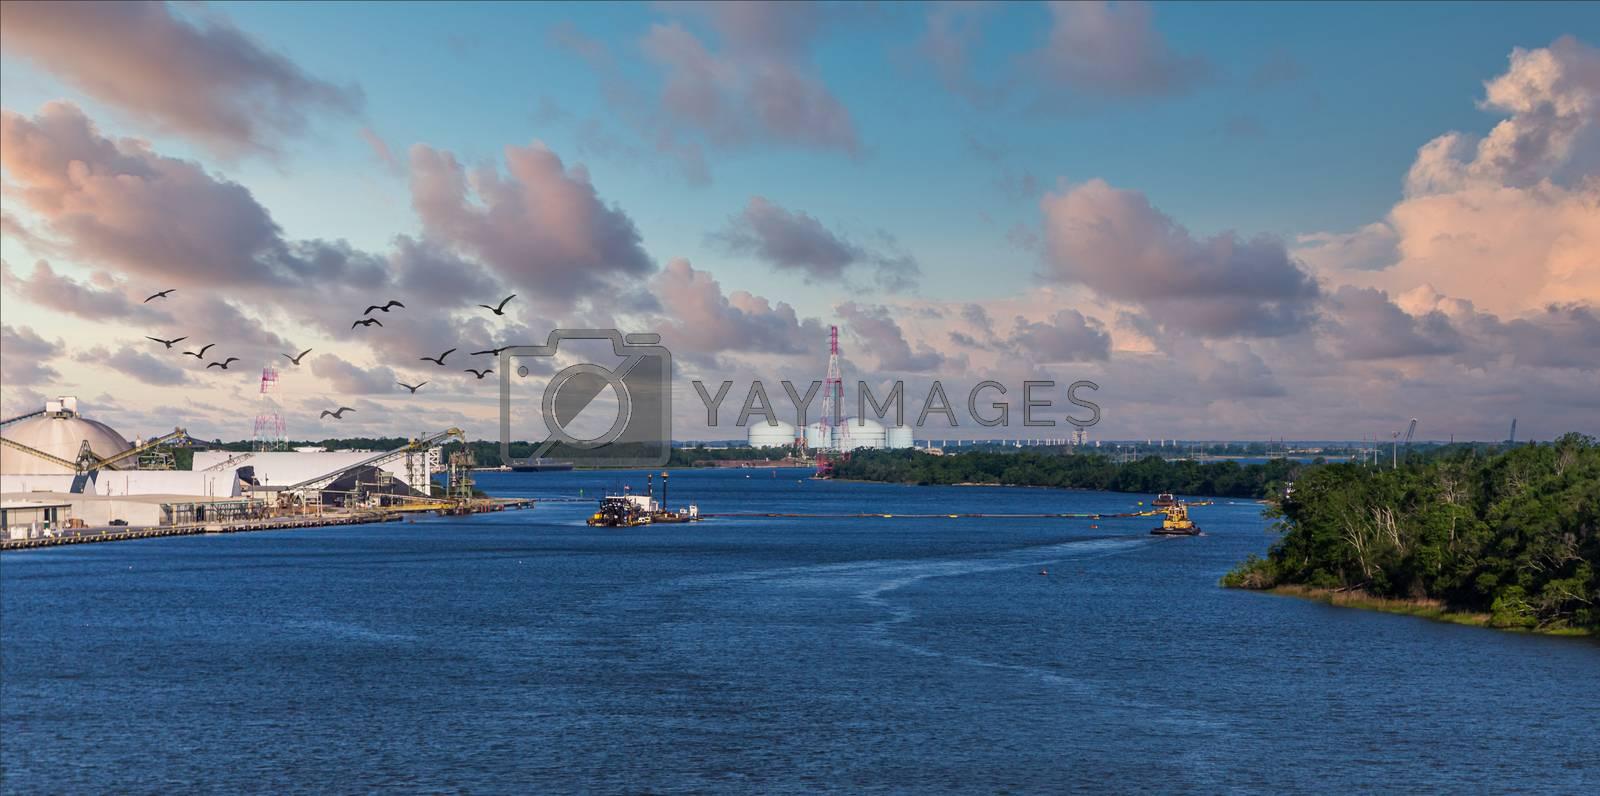 Tugboat on the Savannah River in Georgia